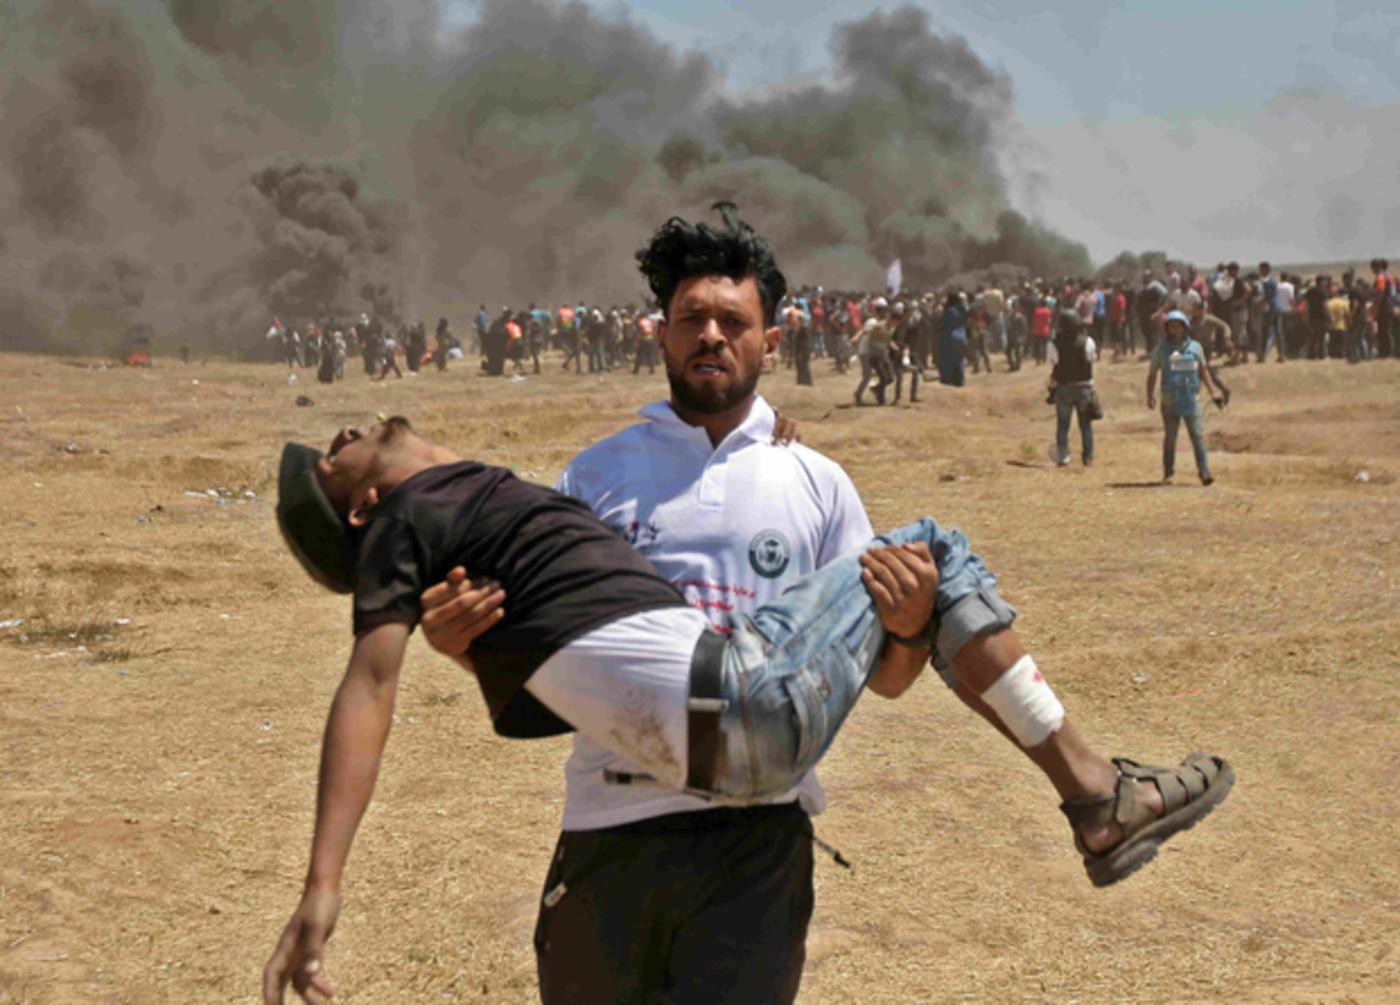 British surgeon says Gaza 2018 protest injuries still untreated